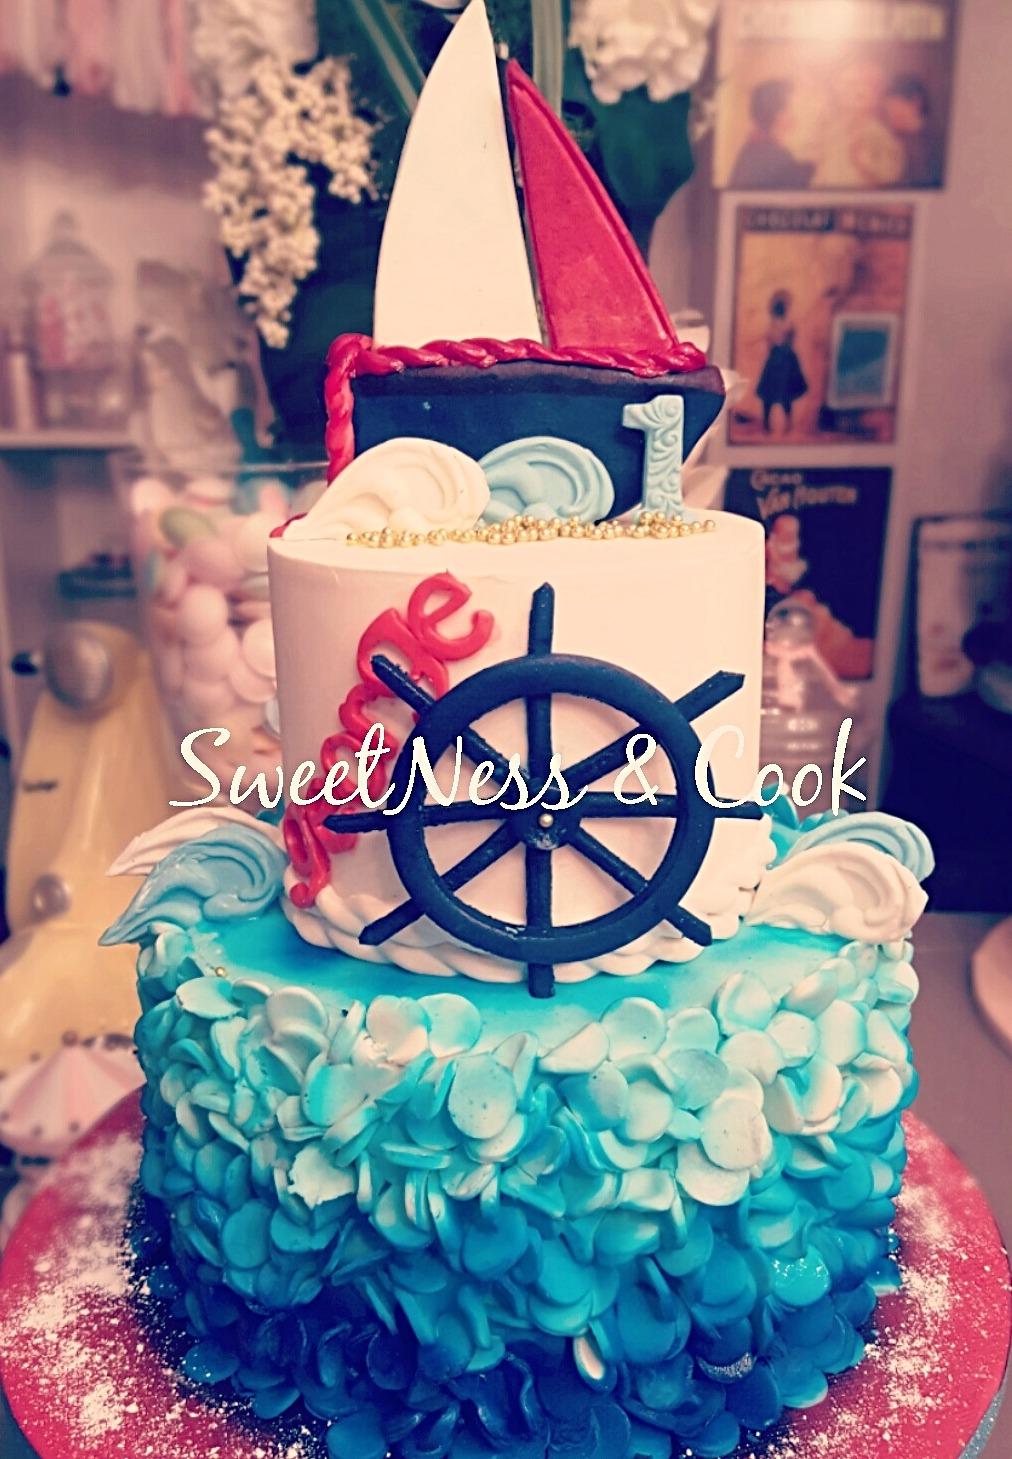 Cake Design Vendée globes